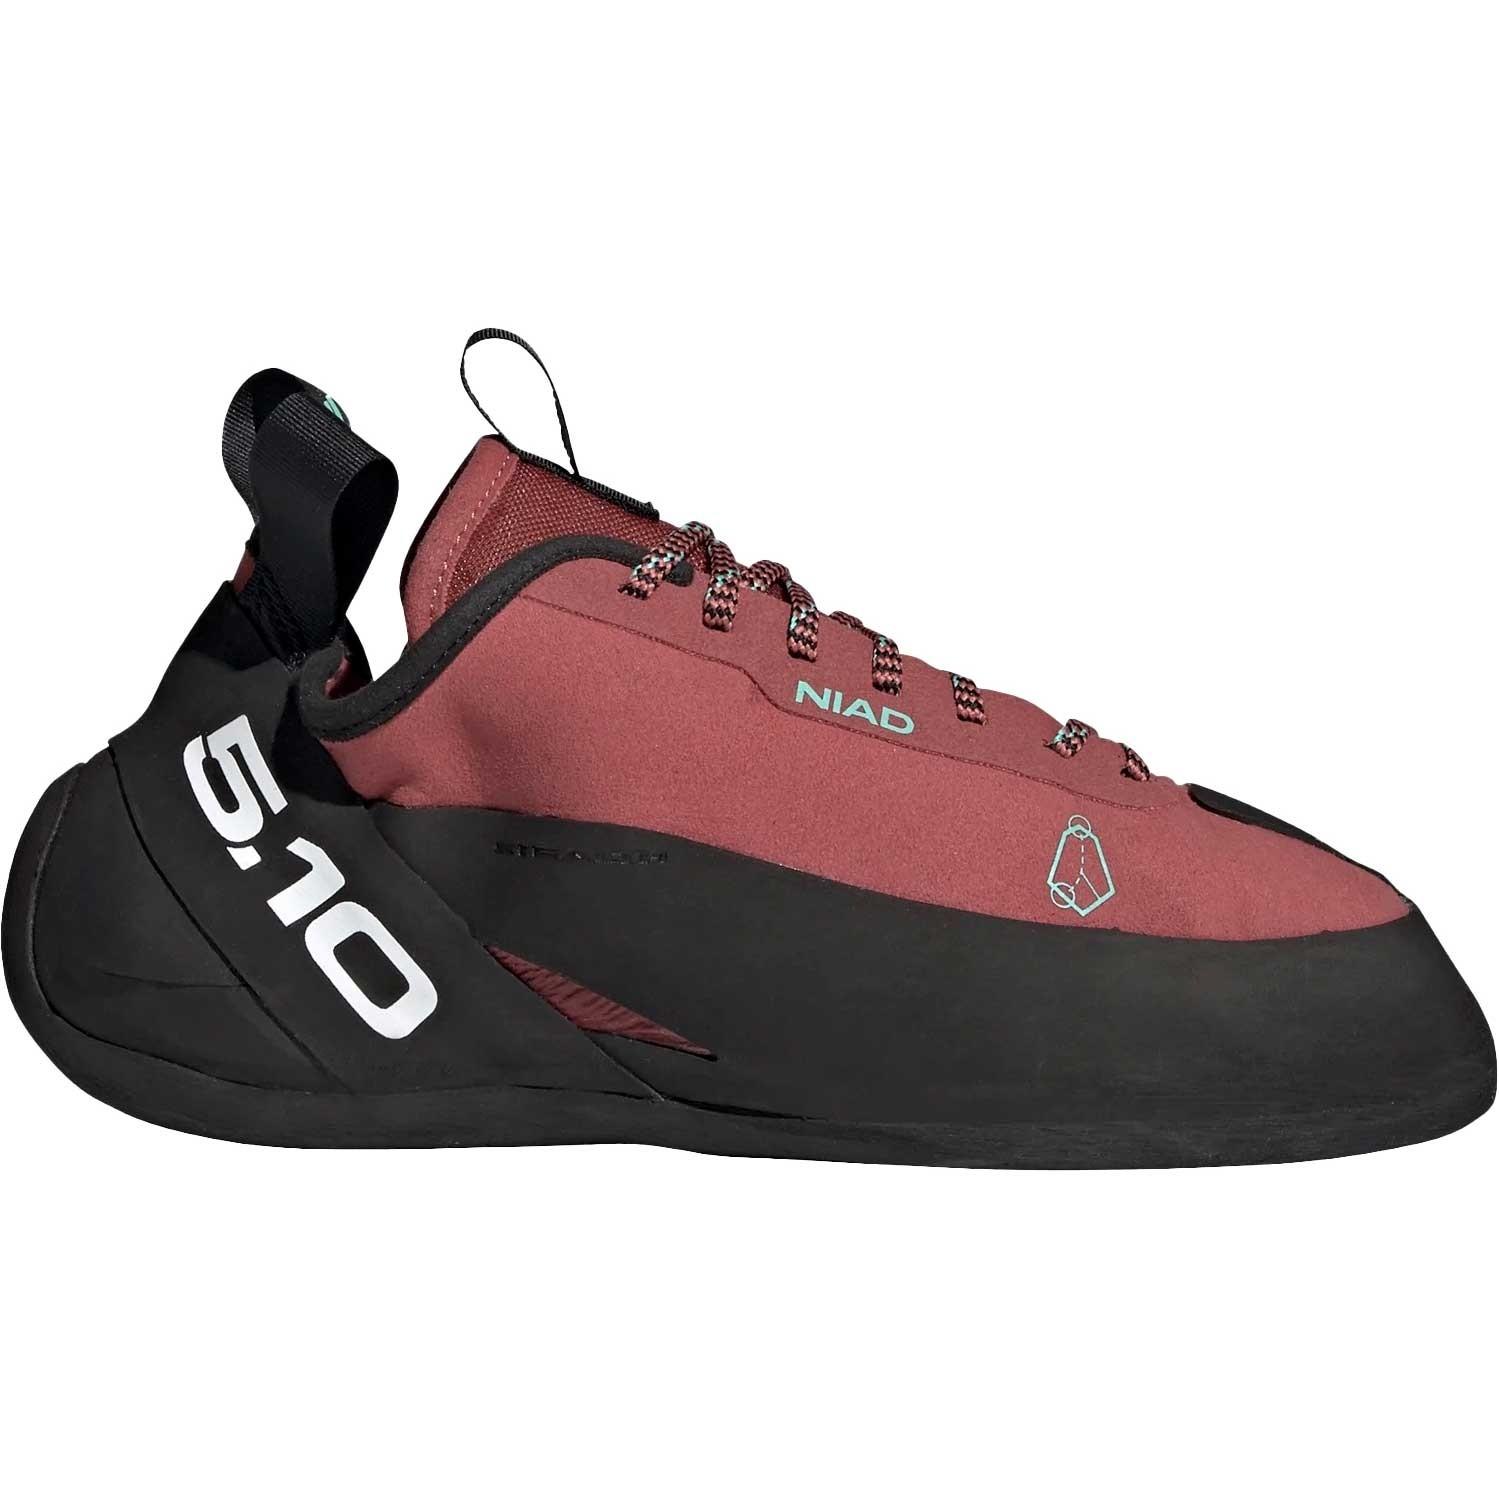 Five.Ten Niad Lace Rock Climbing Shoes - Core Black / Crew Red / Acid Mint